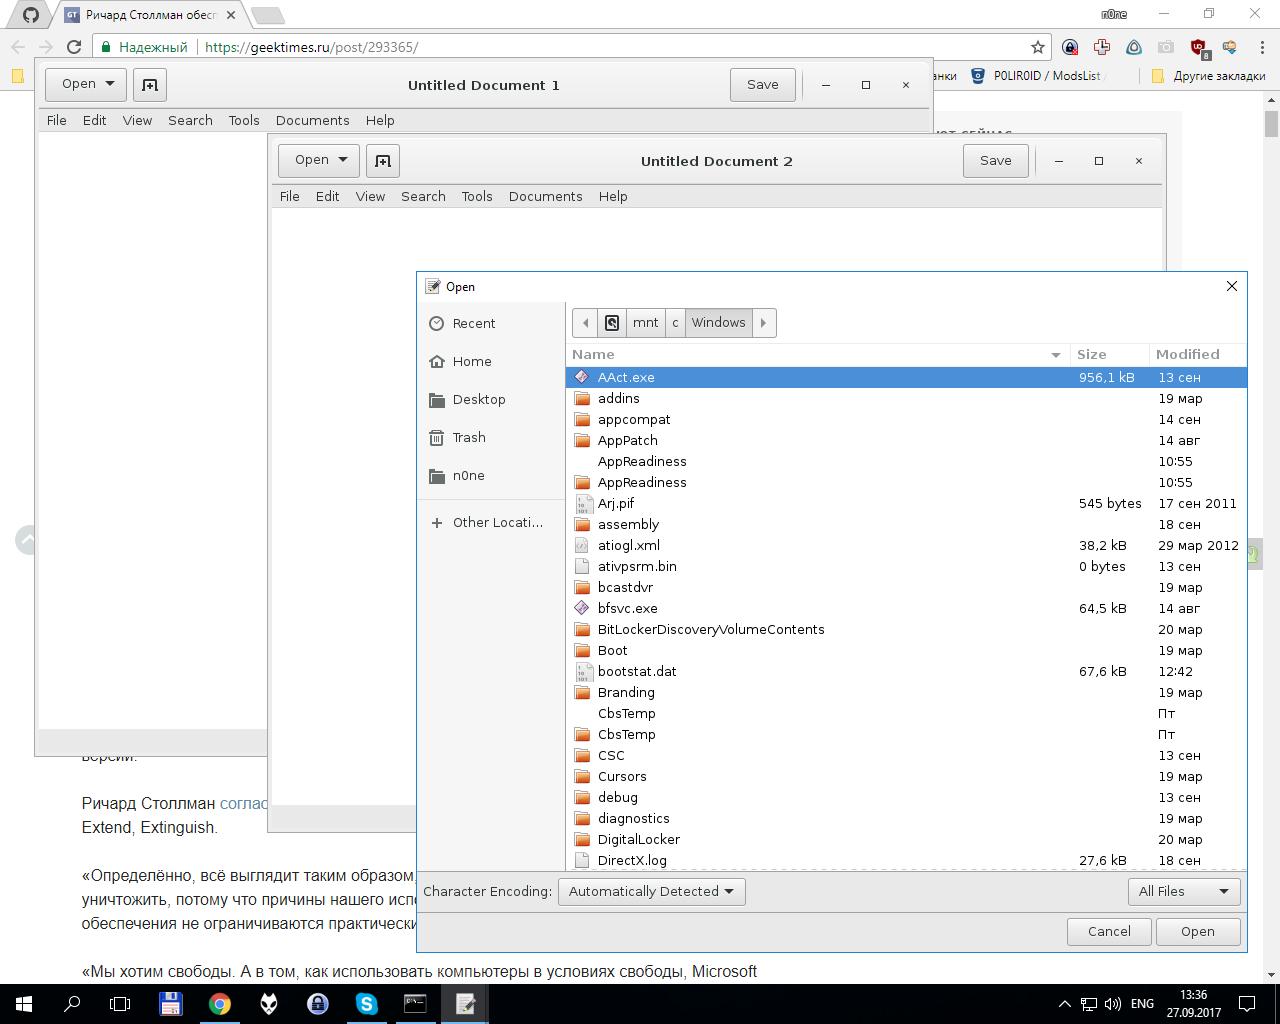 Ричард Столлман обеспокоен любовью Microsoft к Linux / Хабр